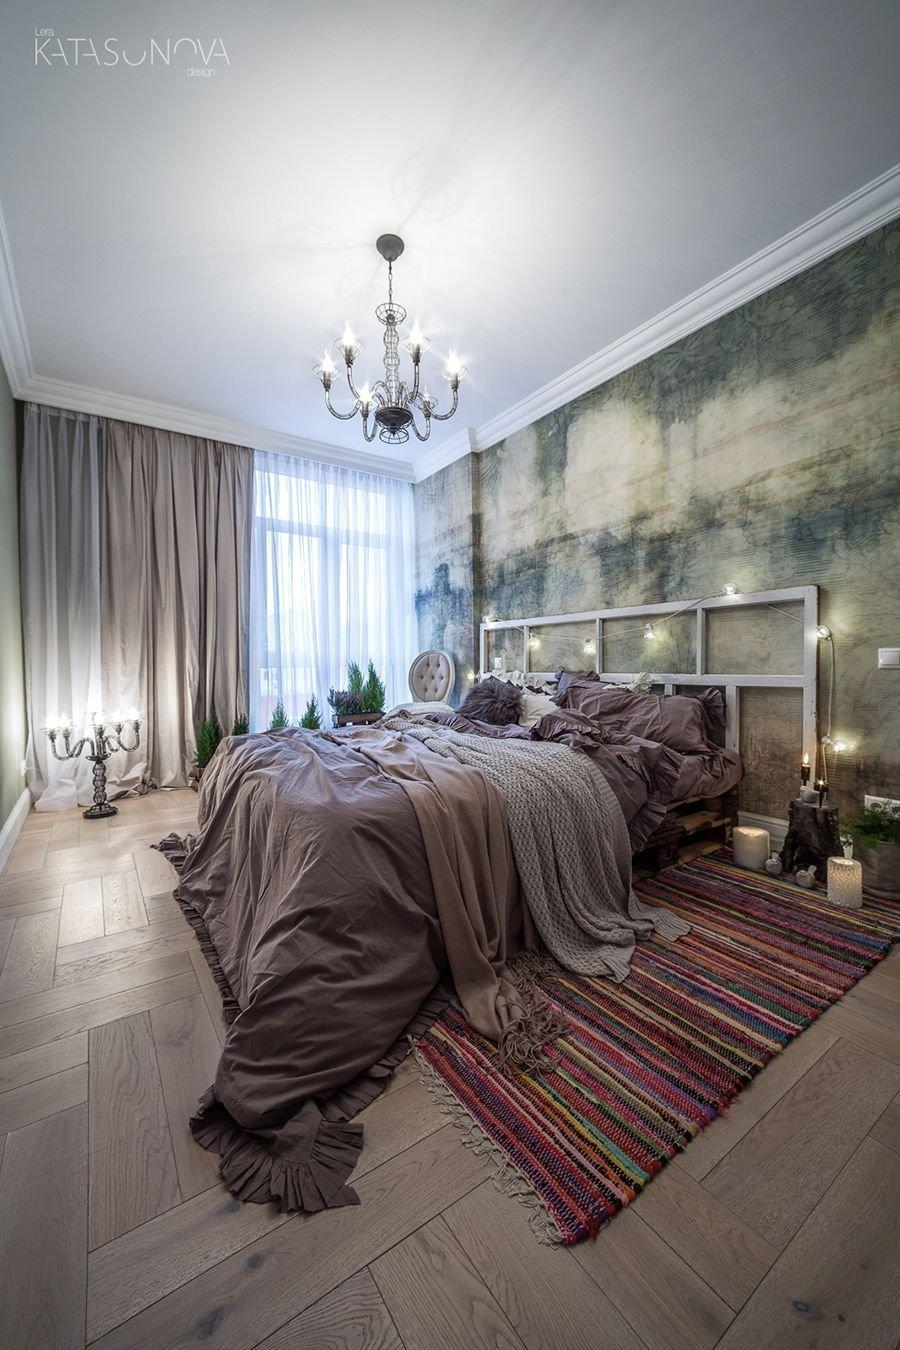 Eklektický interiér s opravdovým kouzlem